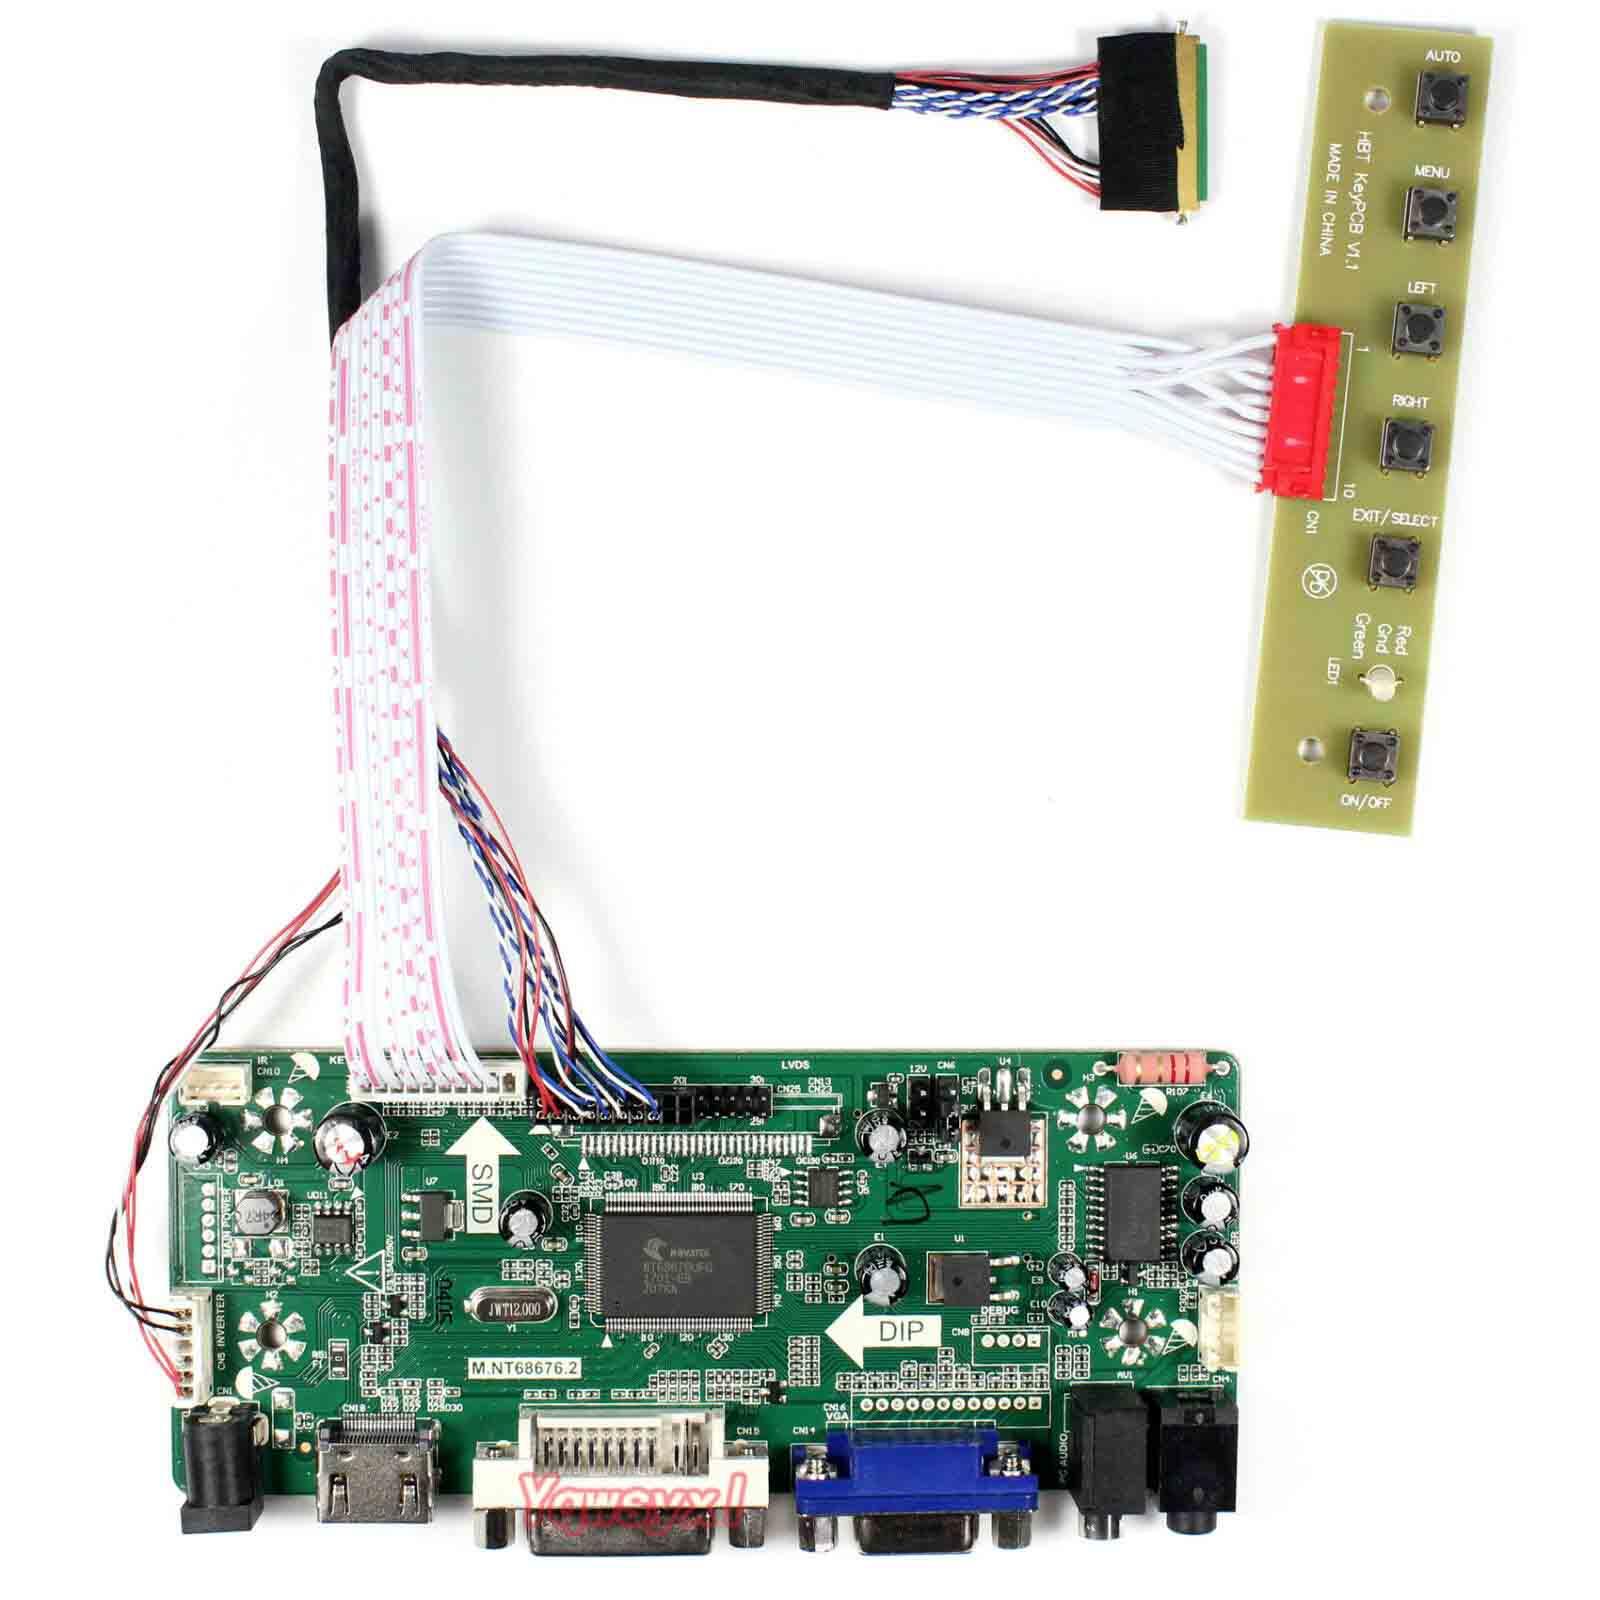 Yqwsyxl Control Board Monitor Kit For LP156WH4(TL)(Q1)  LP156WH4-TLQ1  HDMI+DVI+VGA LCD LED Screen Controller Board Driver